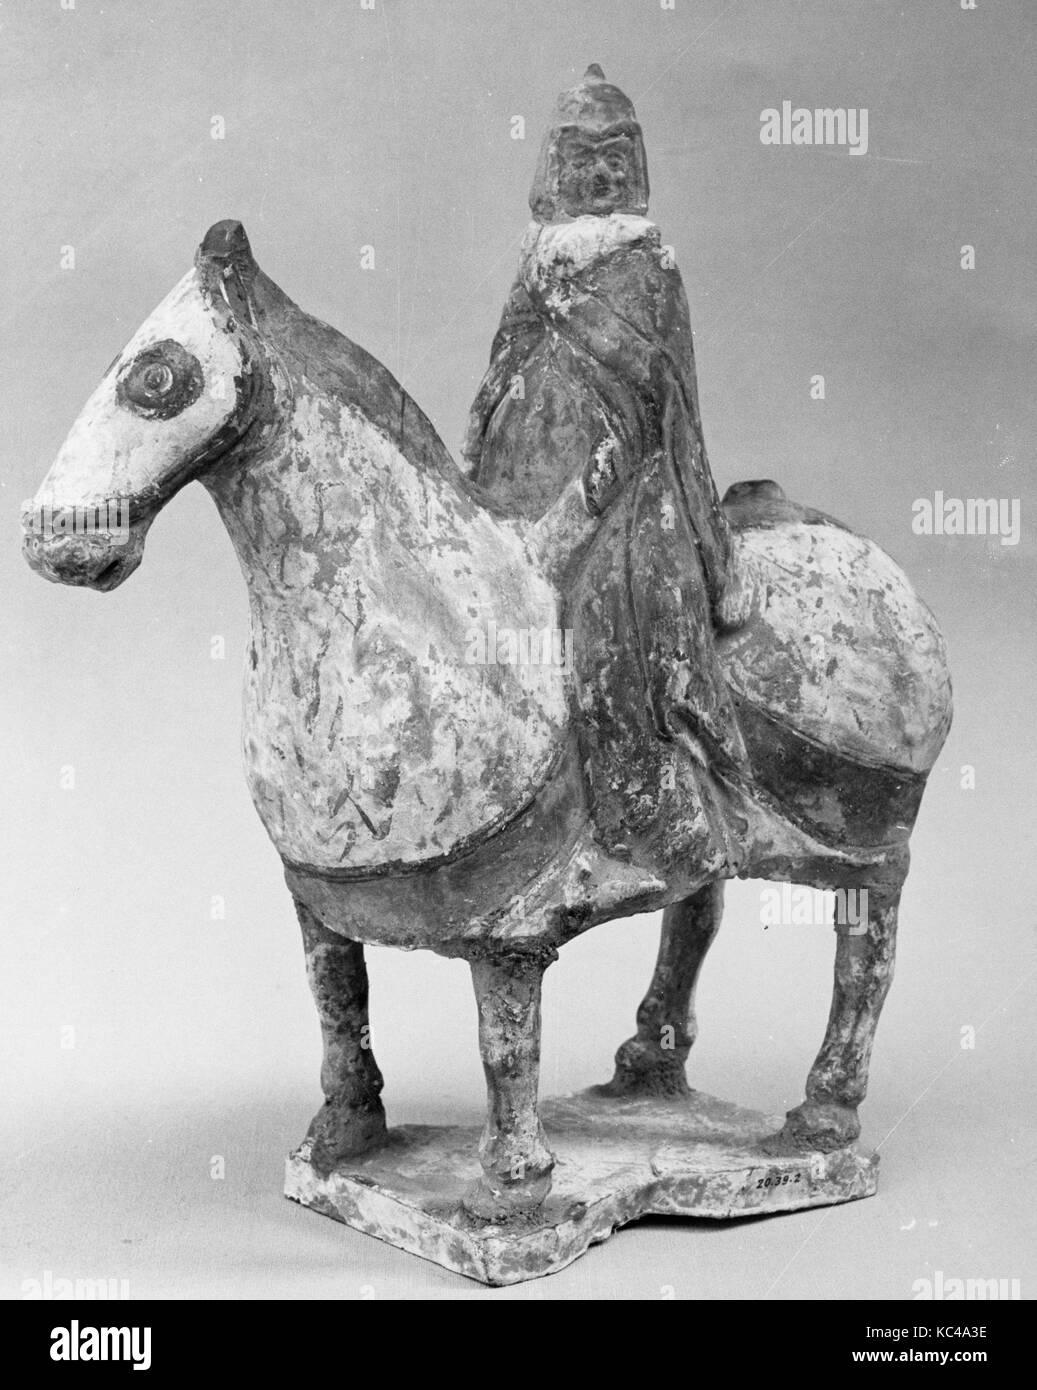 Ceramic Statues Perth Perth Monumental Works Statues